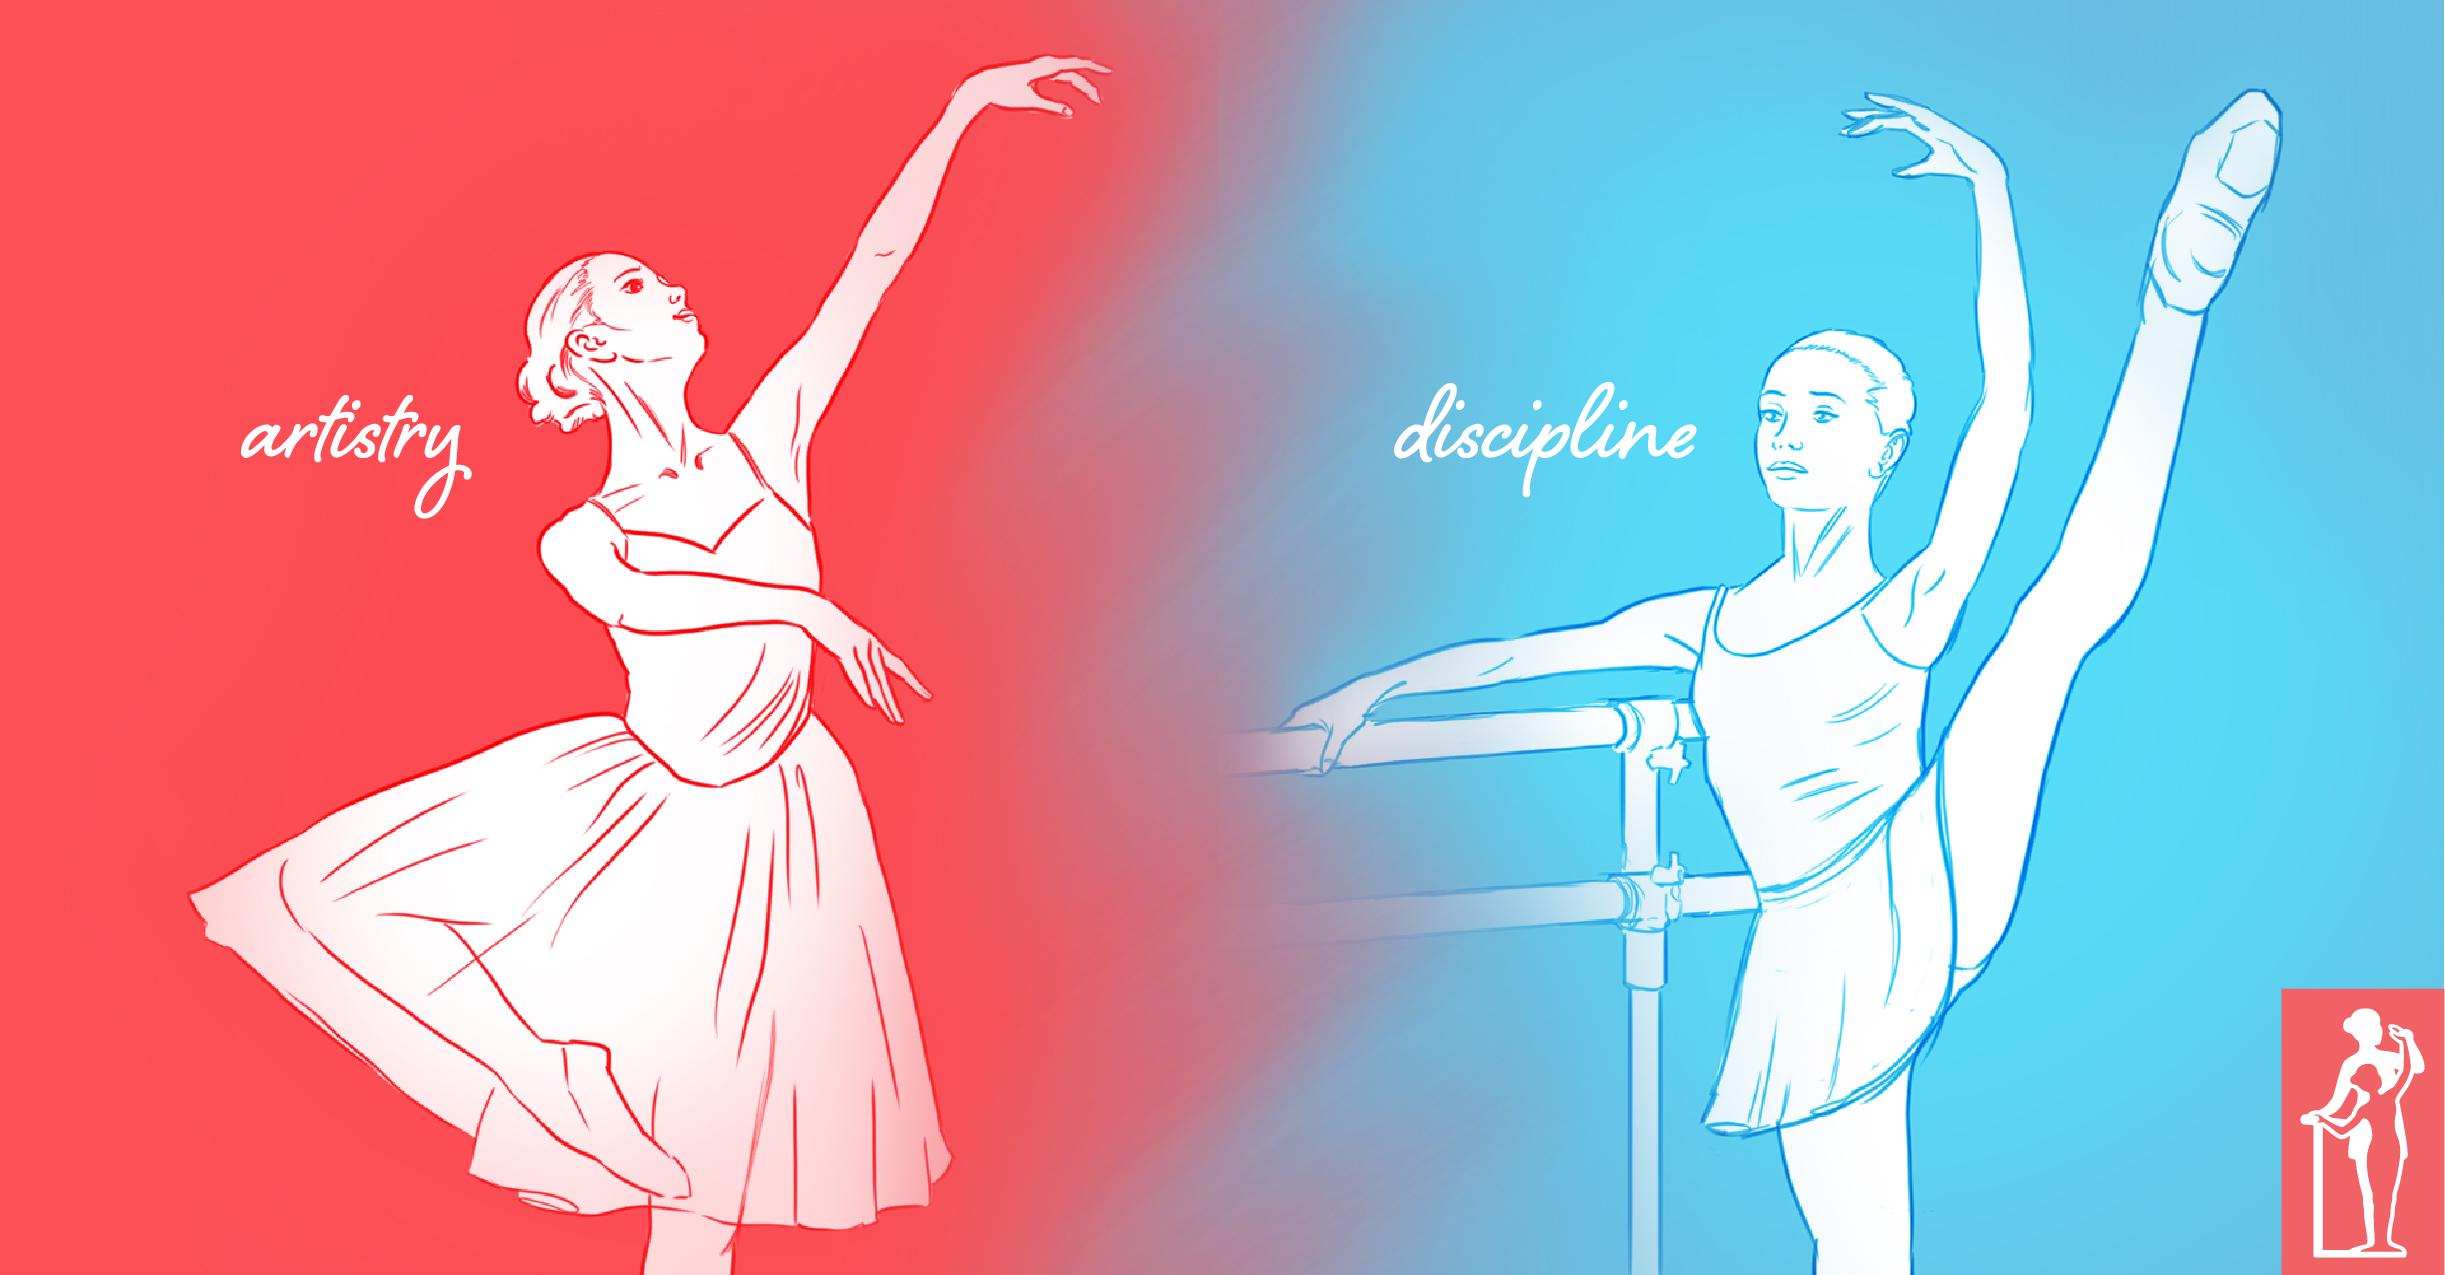 Balancing Artistry and Discipline